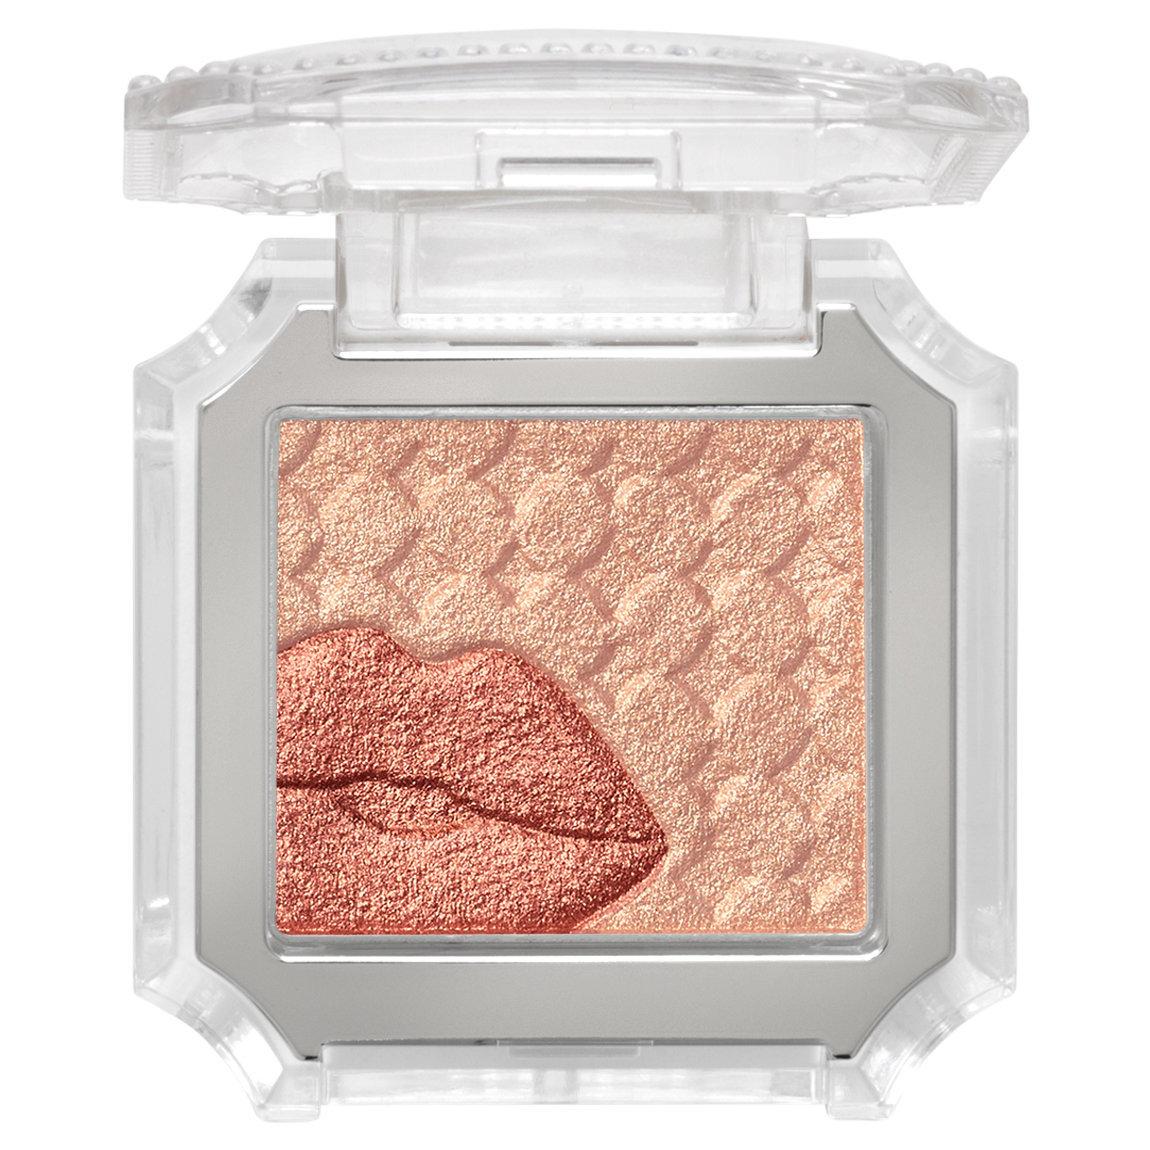 JILL STUART Beauty Iconic Look Eyeshadow Crystal Carat 05 product swatch.